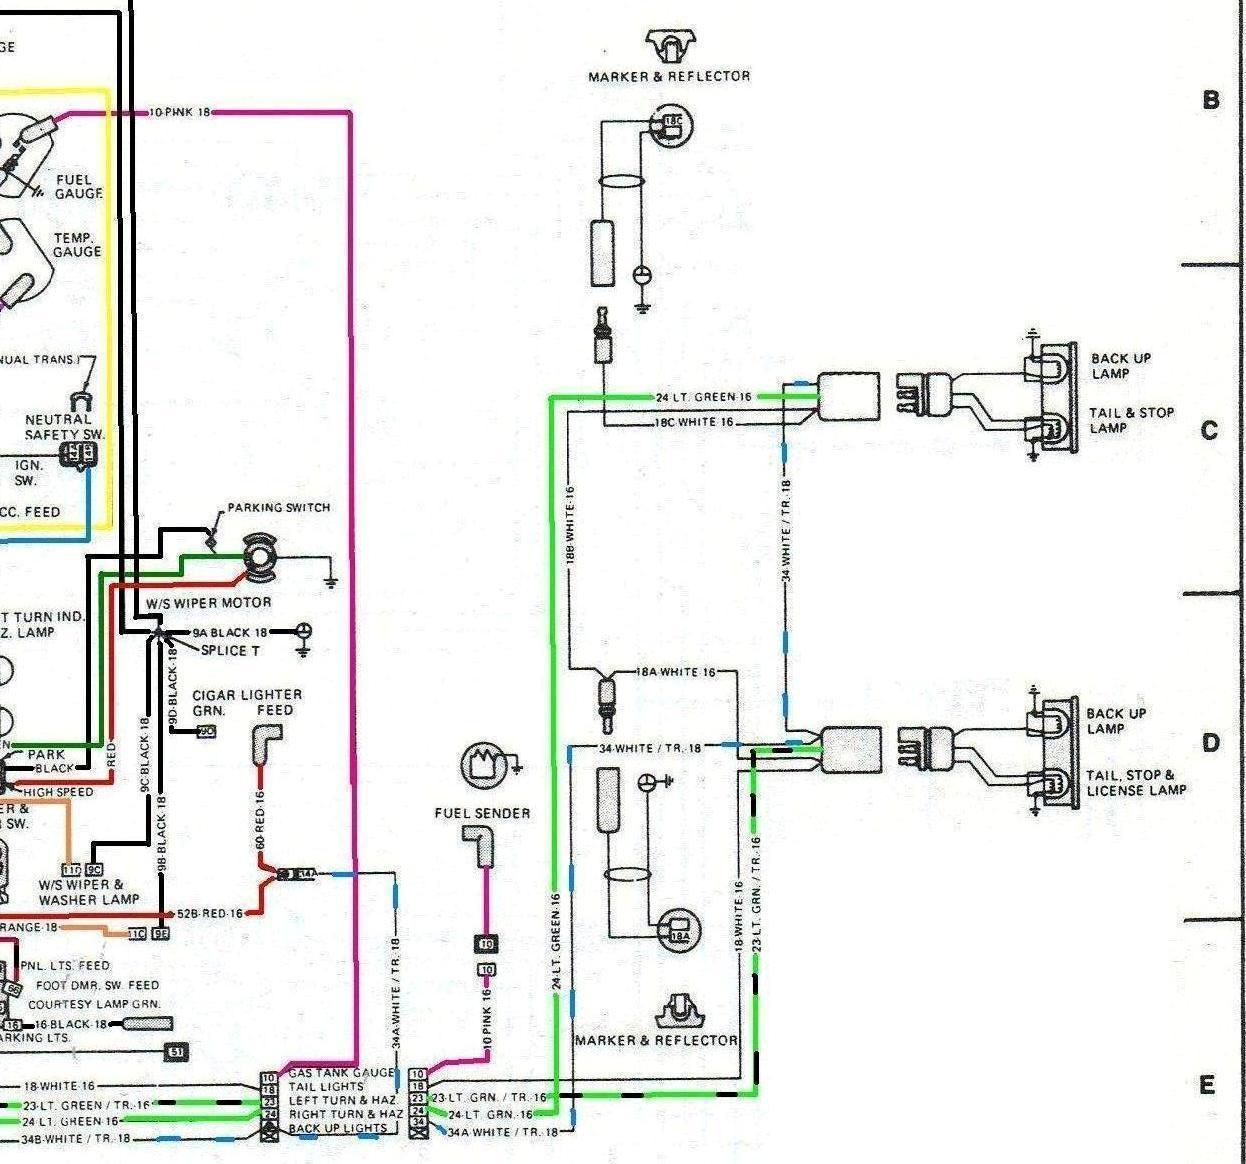 Jeep Cj7 Headlight Wiring Wiring Diagram General A General A Emilia Fise It